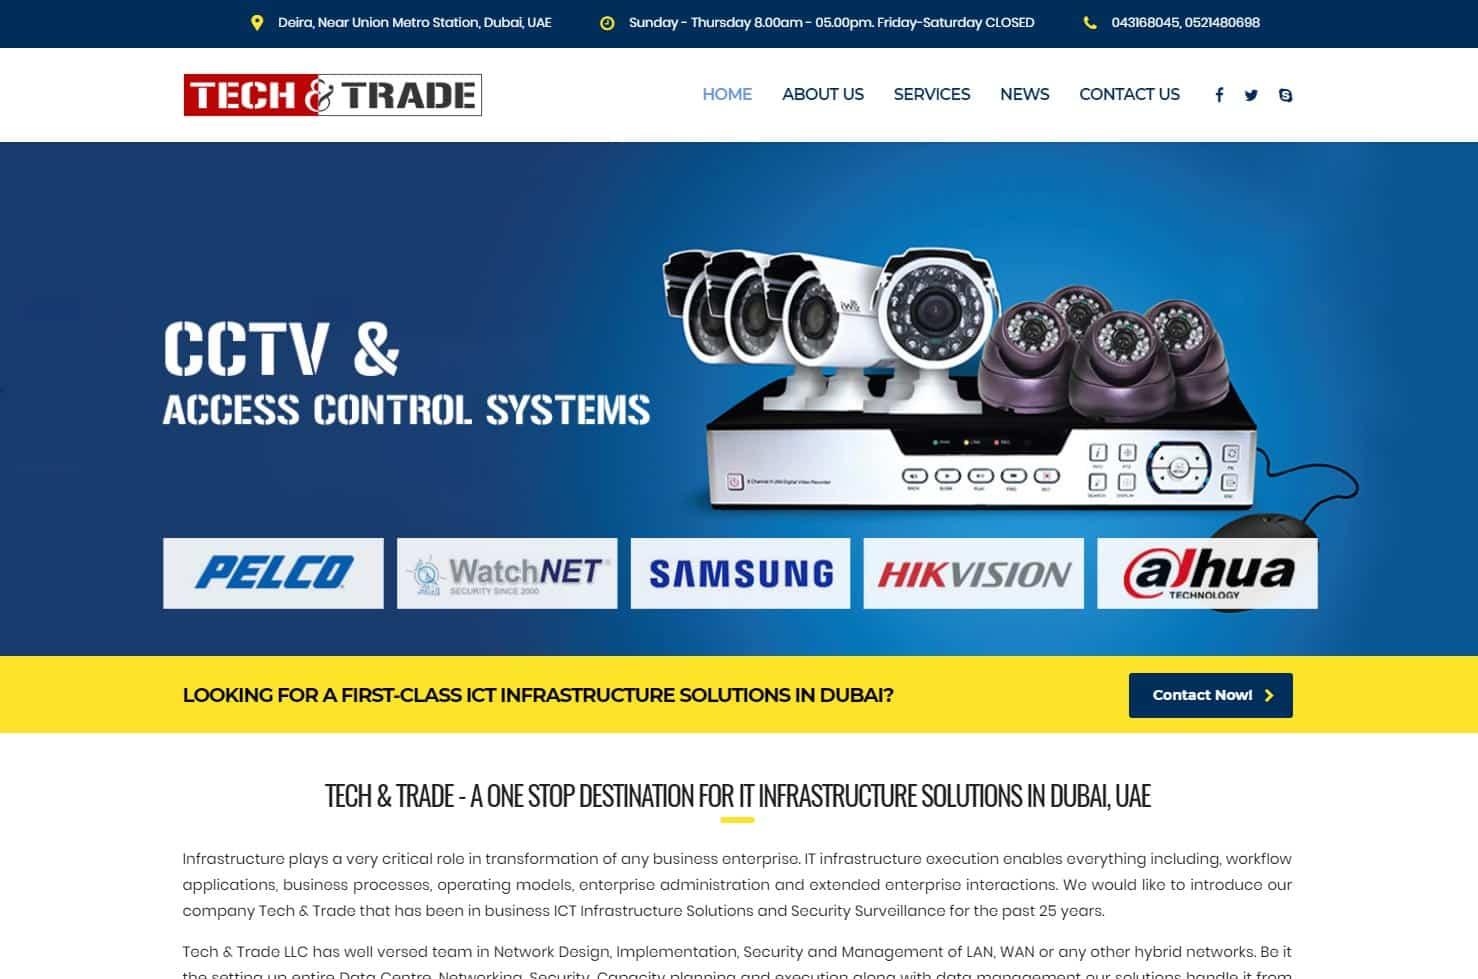 Website Designers in Dubai | Web Design, Web Development In